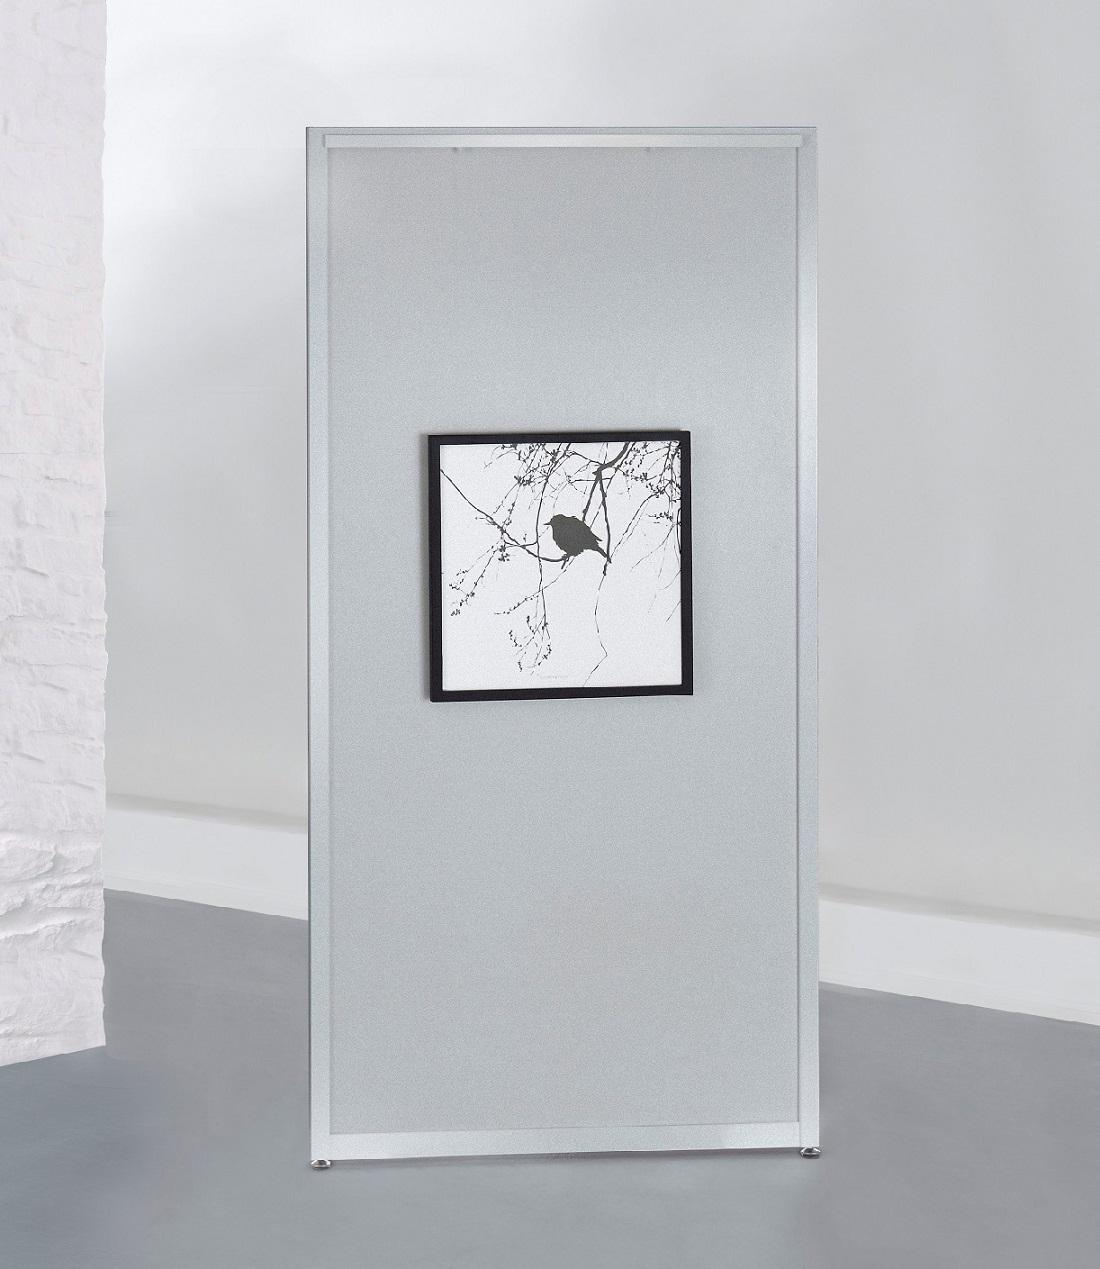 Stellwandmodul 'Screen Art' in Dekor silber in den Maßen 100 x 198 cm